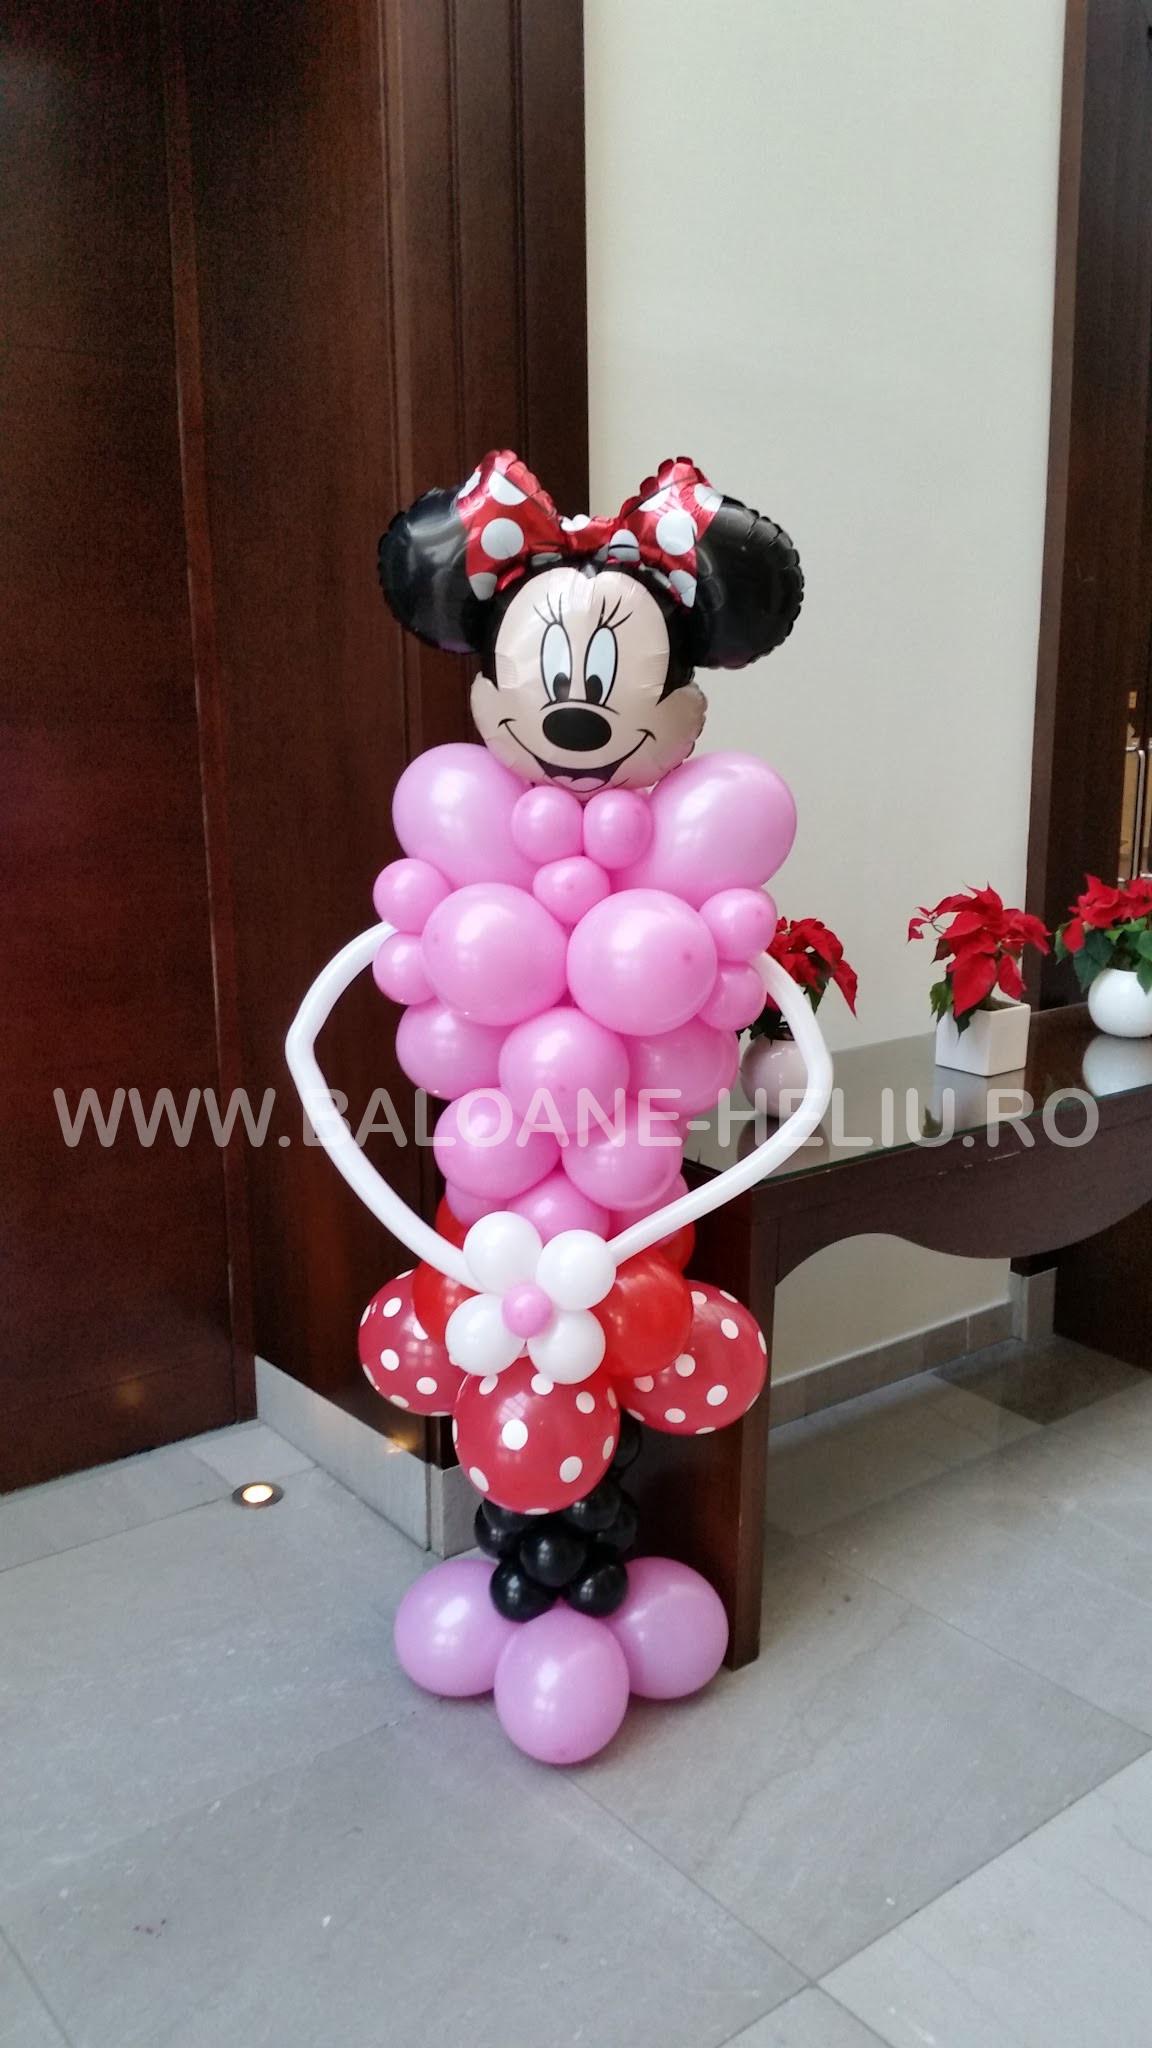 Pachet baloane Minnie Mouse